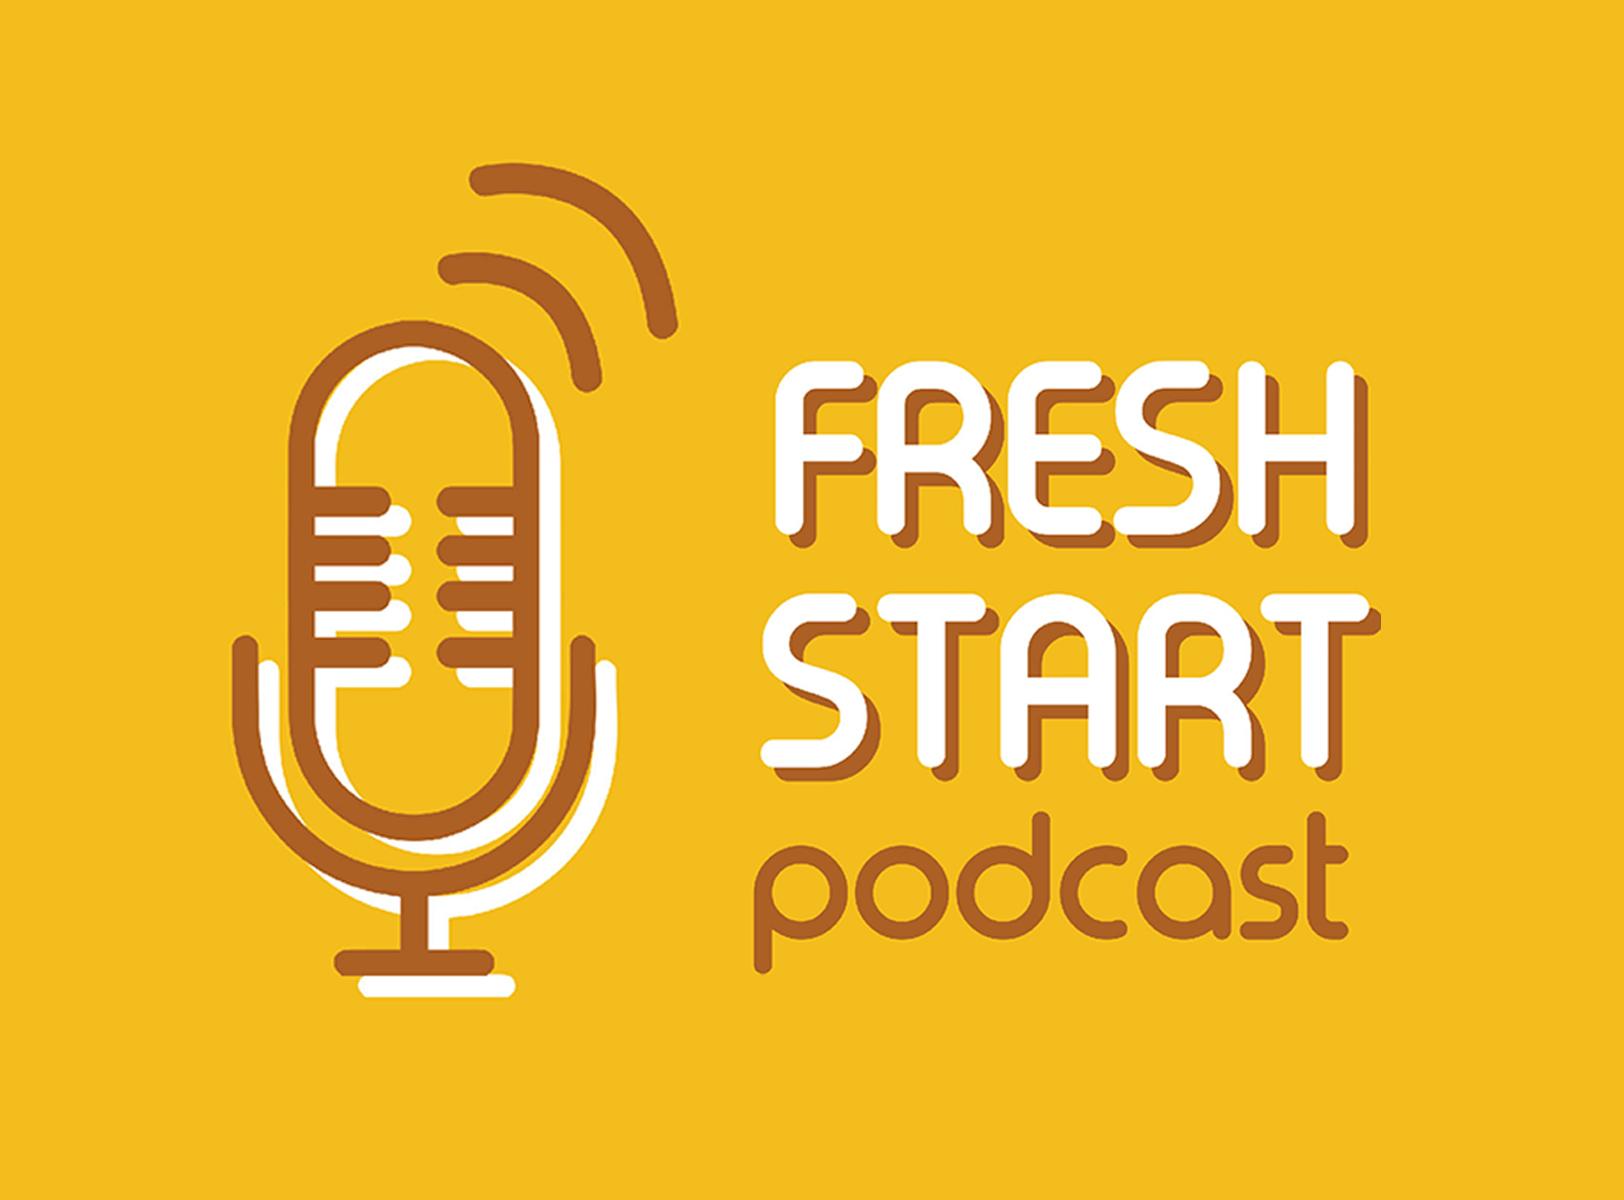 Fresh Start: Podcast News (9/22/2019 Sun.)